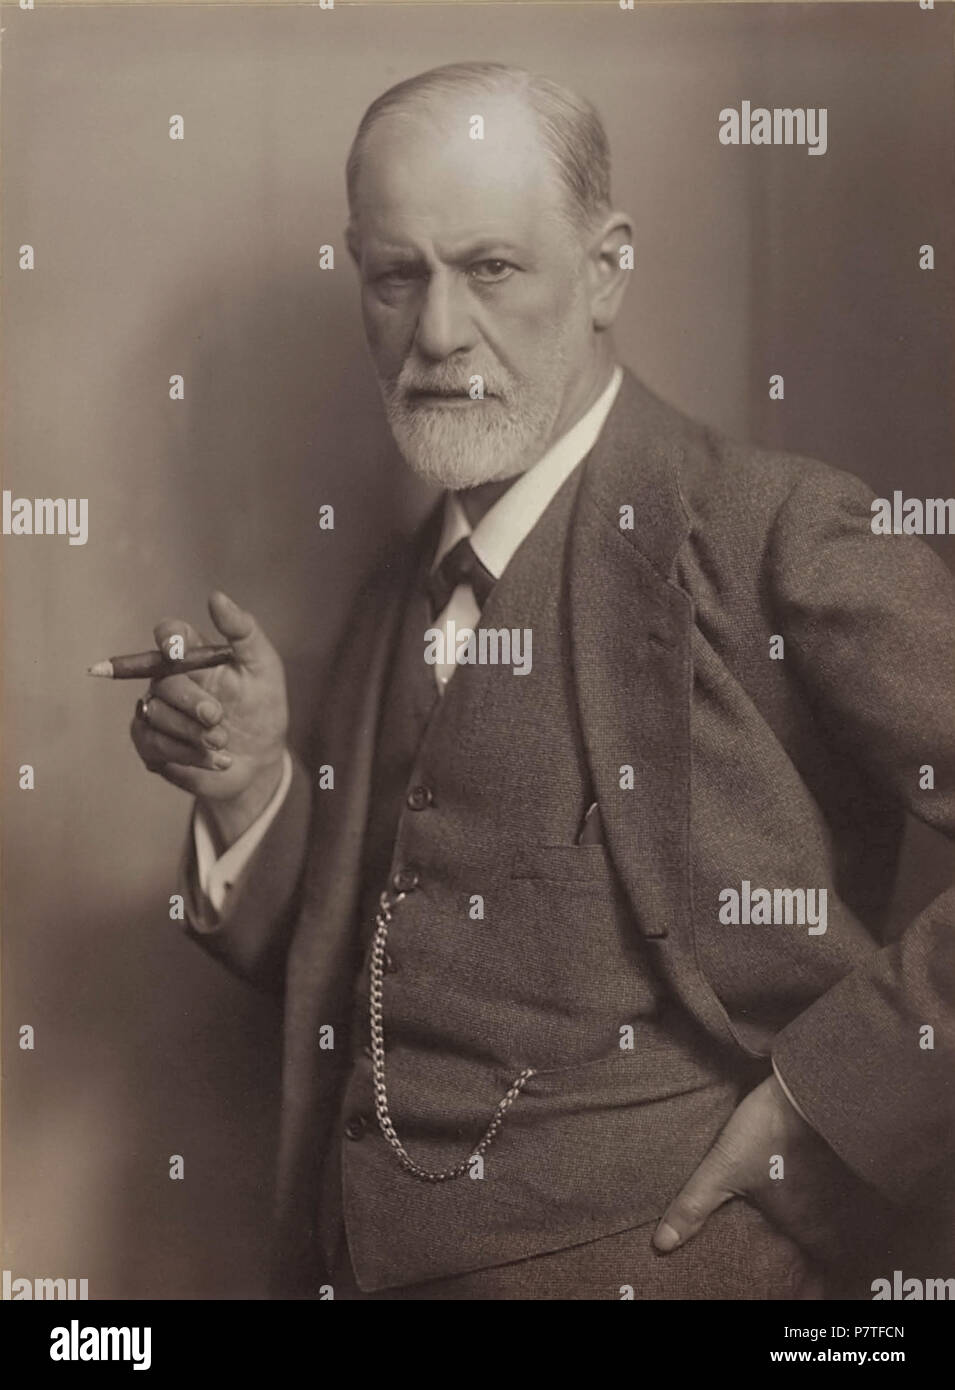 English: Photographic portrait of Sigmund Freud, signed by the sitter ('Prof. Sigmund Freud') . circa 1921 346 Sigmund Freud, by Max Halberstadt (cropped) - Stock Image